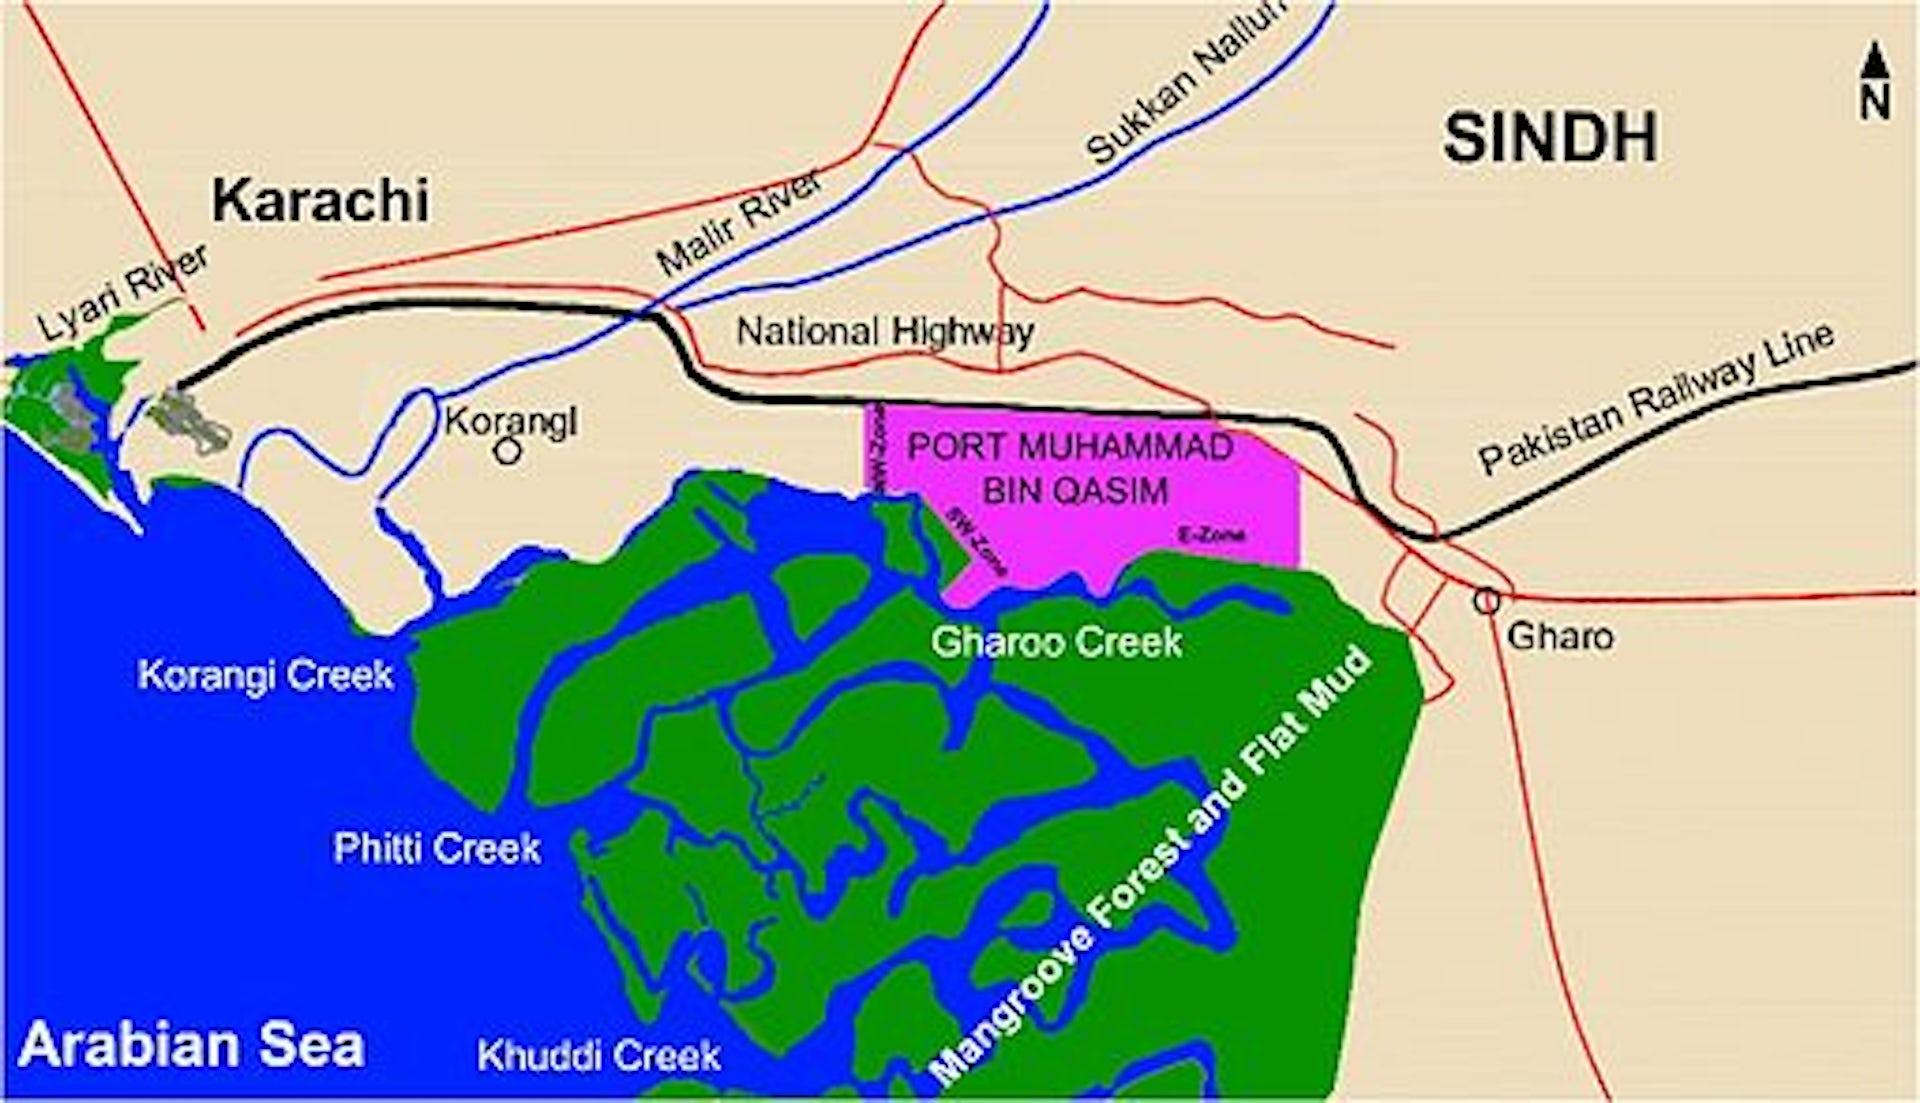 Location Map Of The Port Qasim Project In Karachi, Pakistan Source:  Wikimedia